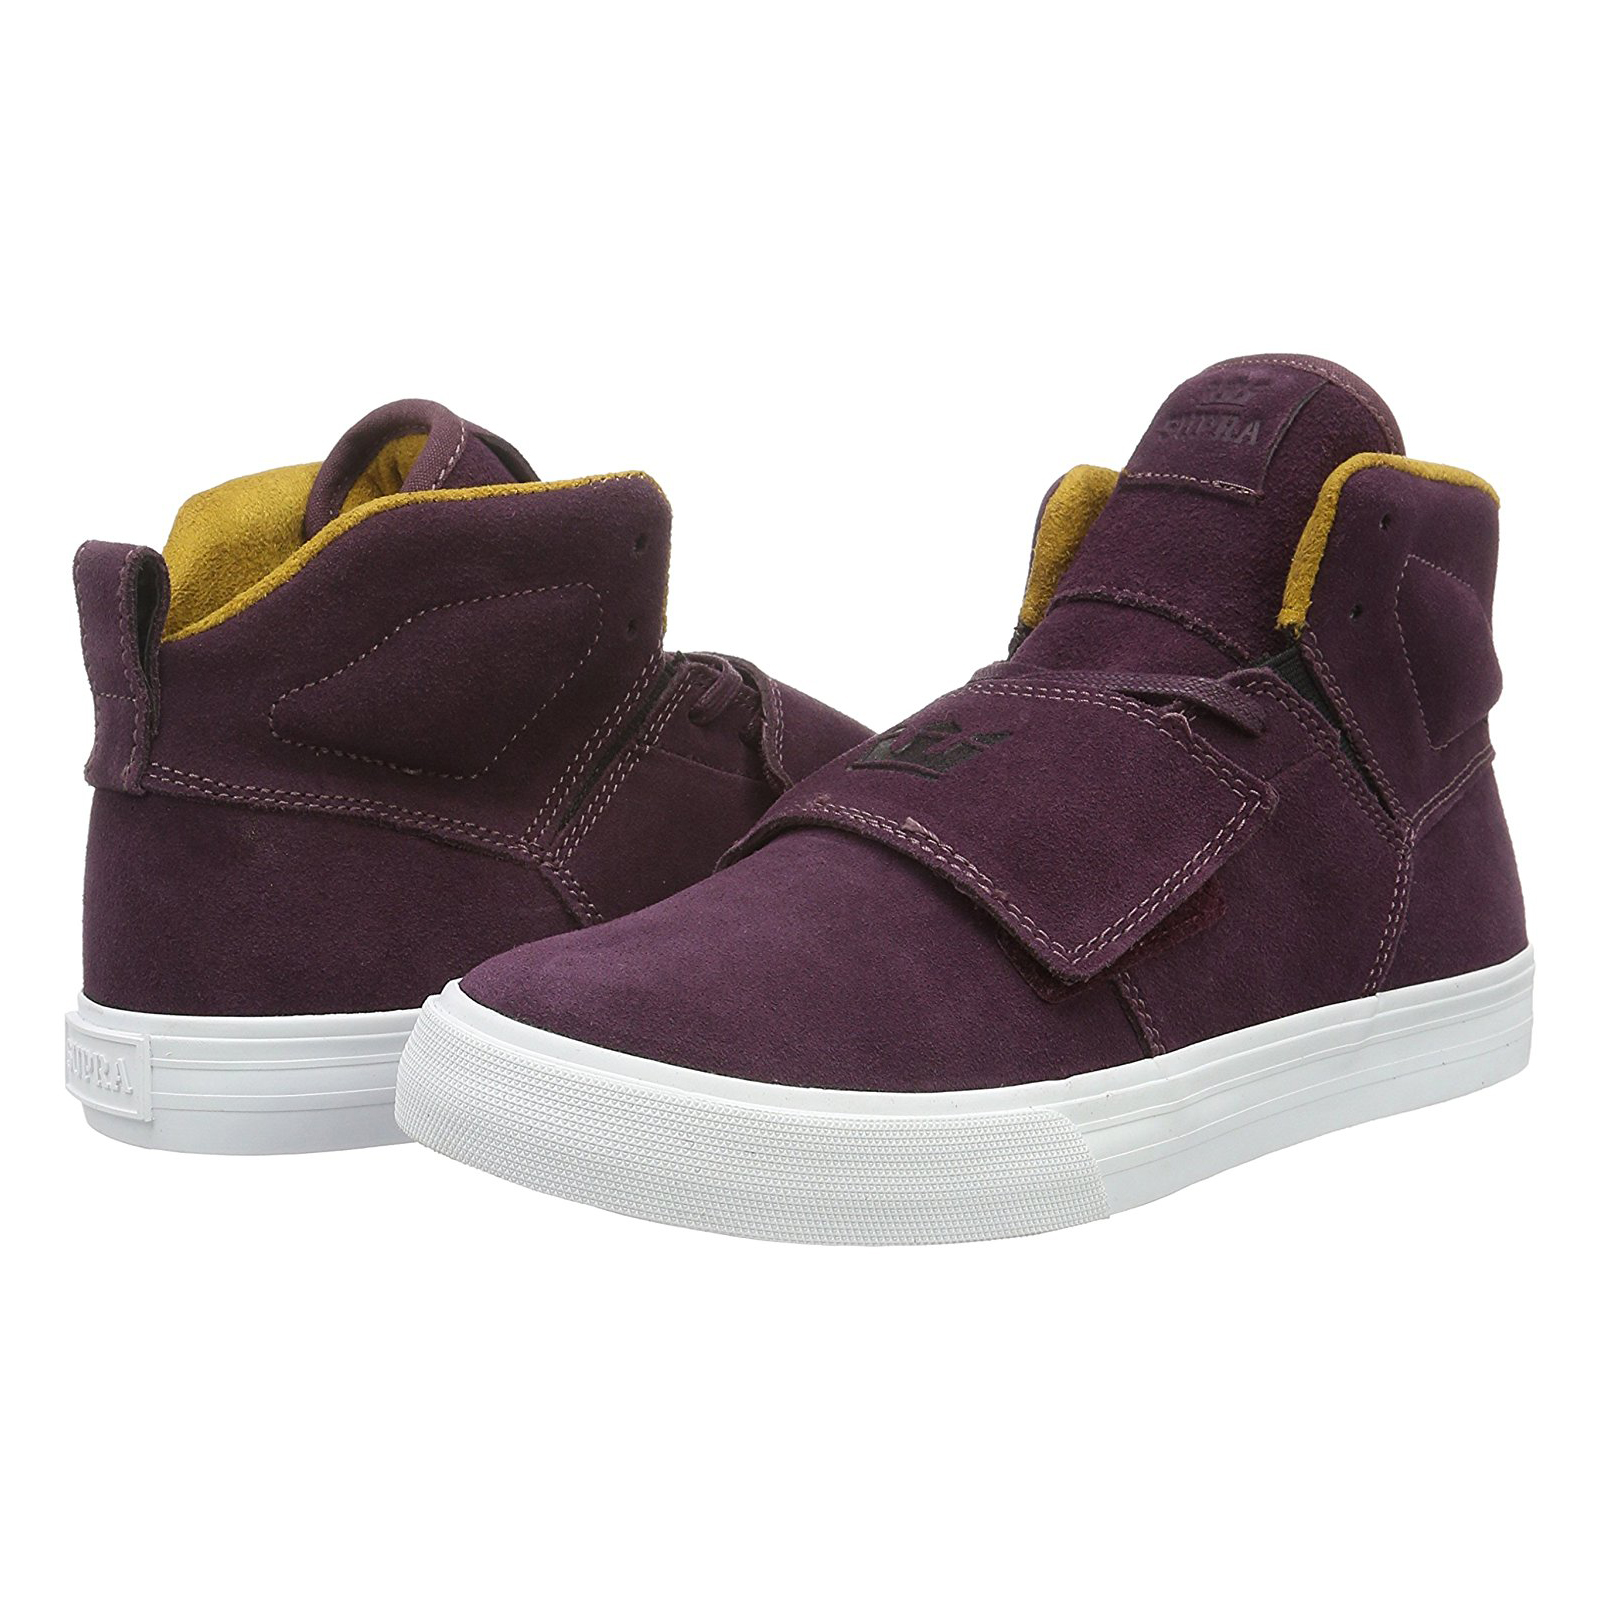 the best attitude f3fe3 48593 ... Nike Air Max Zero SE  918232-001  Men Casual Shoes Shoes Shoes Black ...